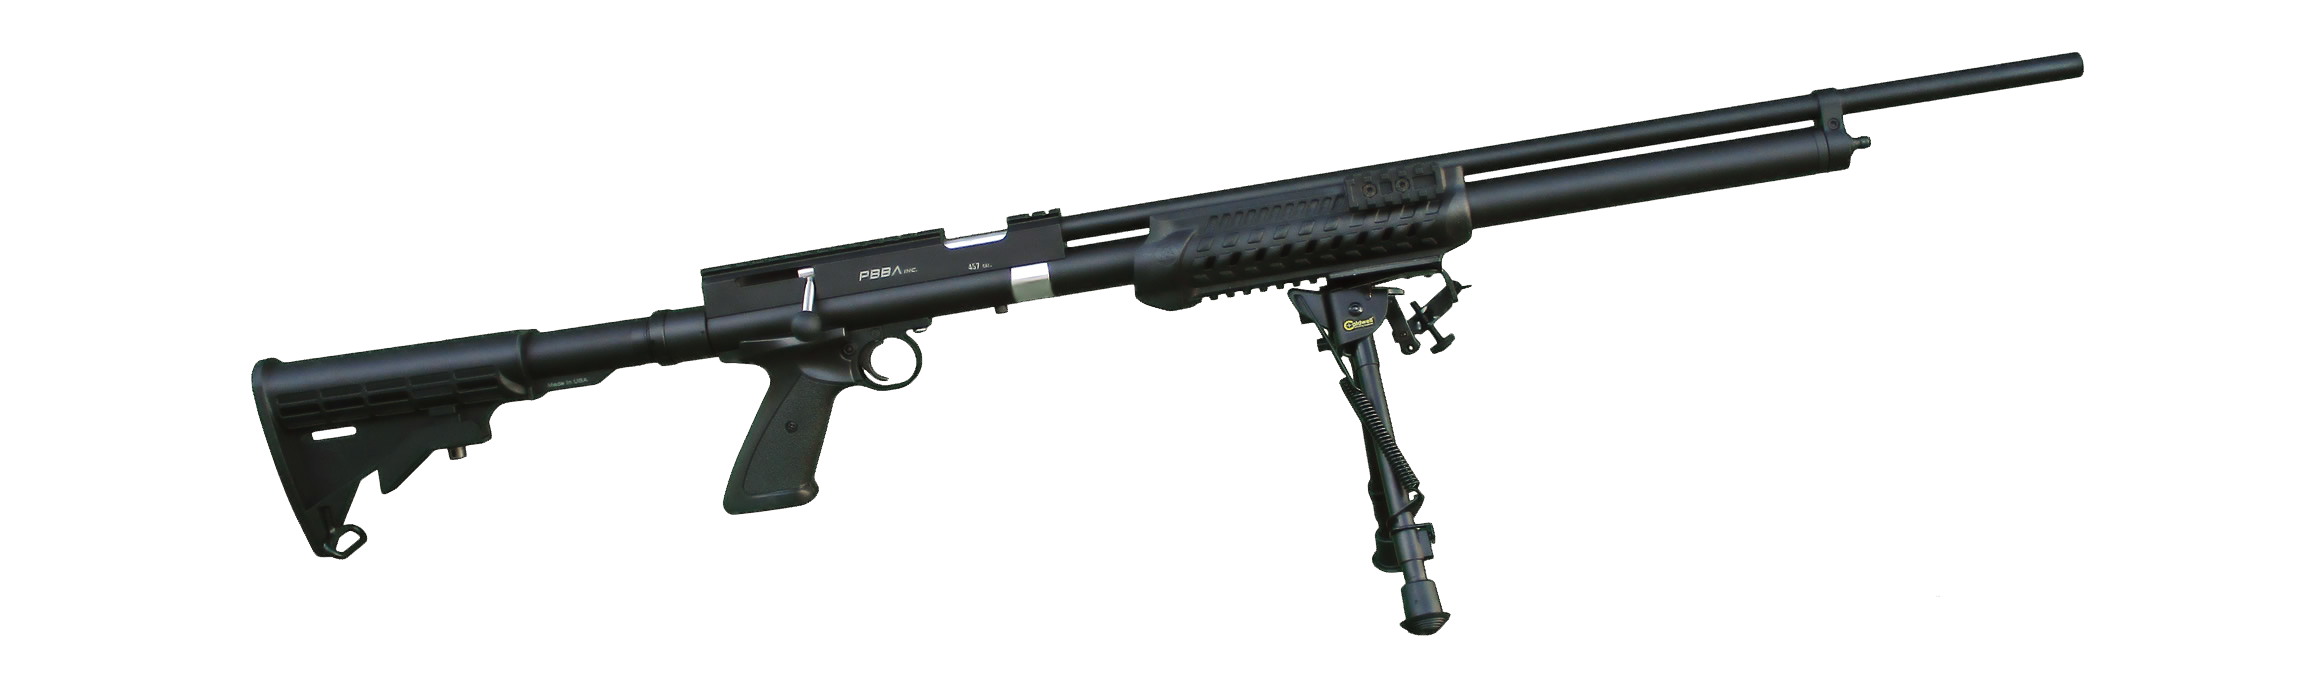 Hunting Big Bore Air Guns by PBBA Inc – Air Gun Hunts, Big